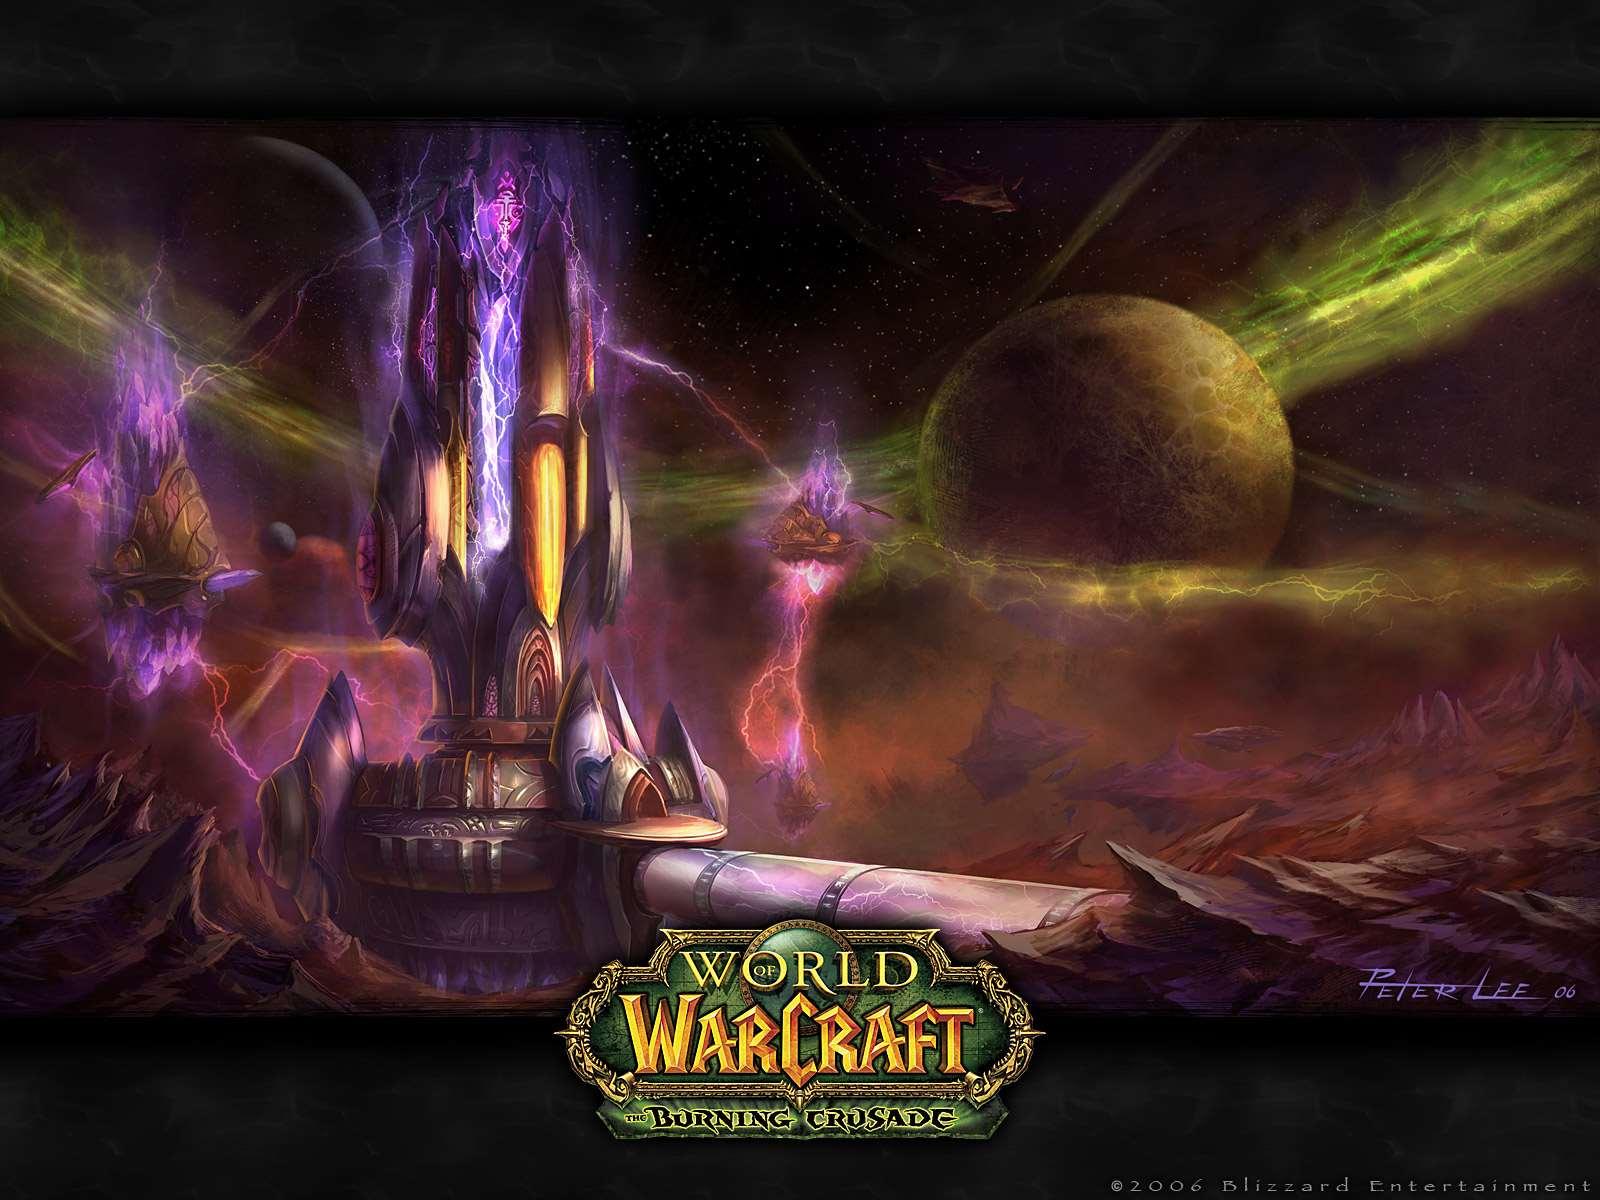 World Of Warcraft Official Wow Burning Crusade Wallpaper